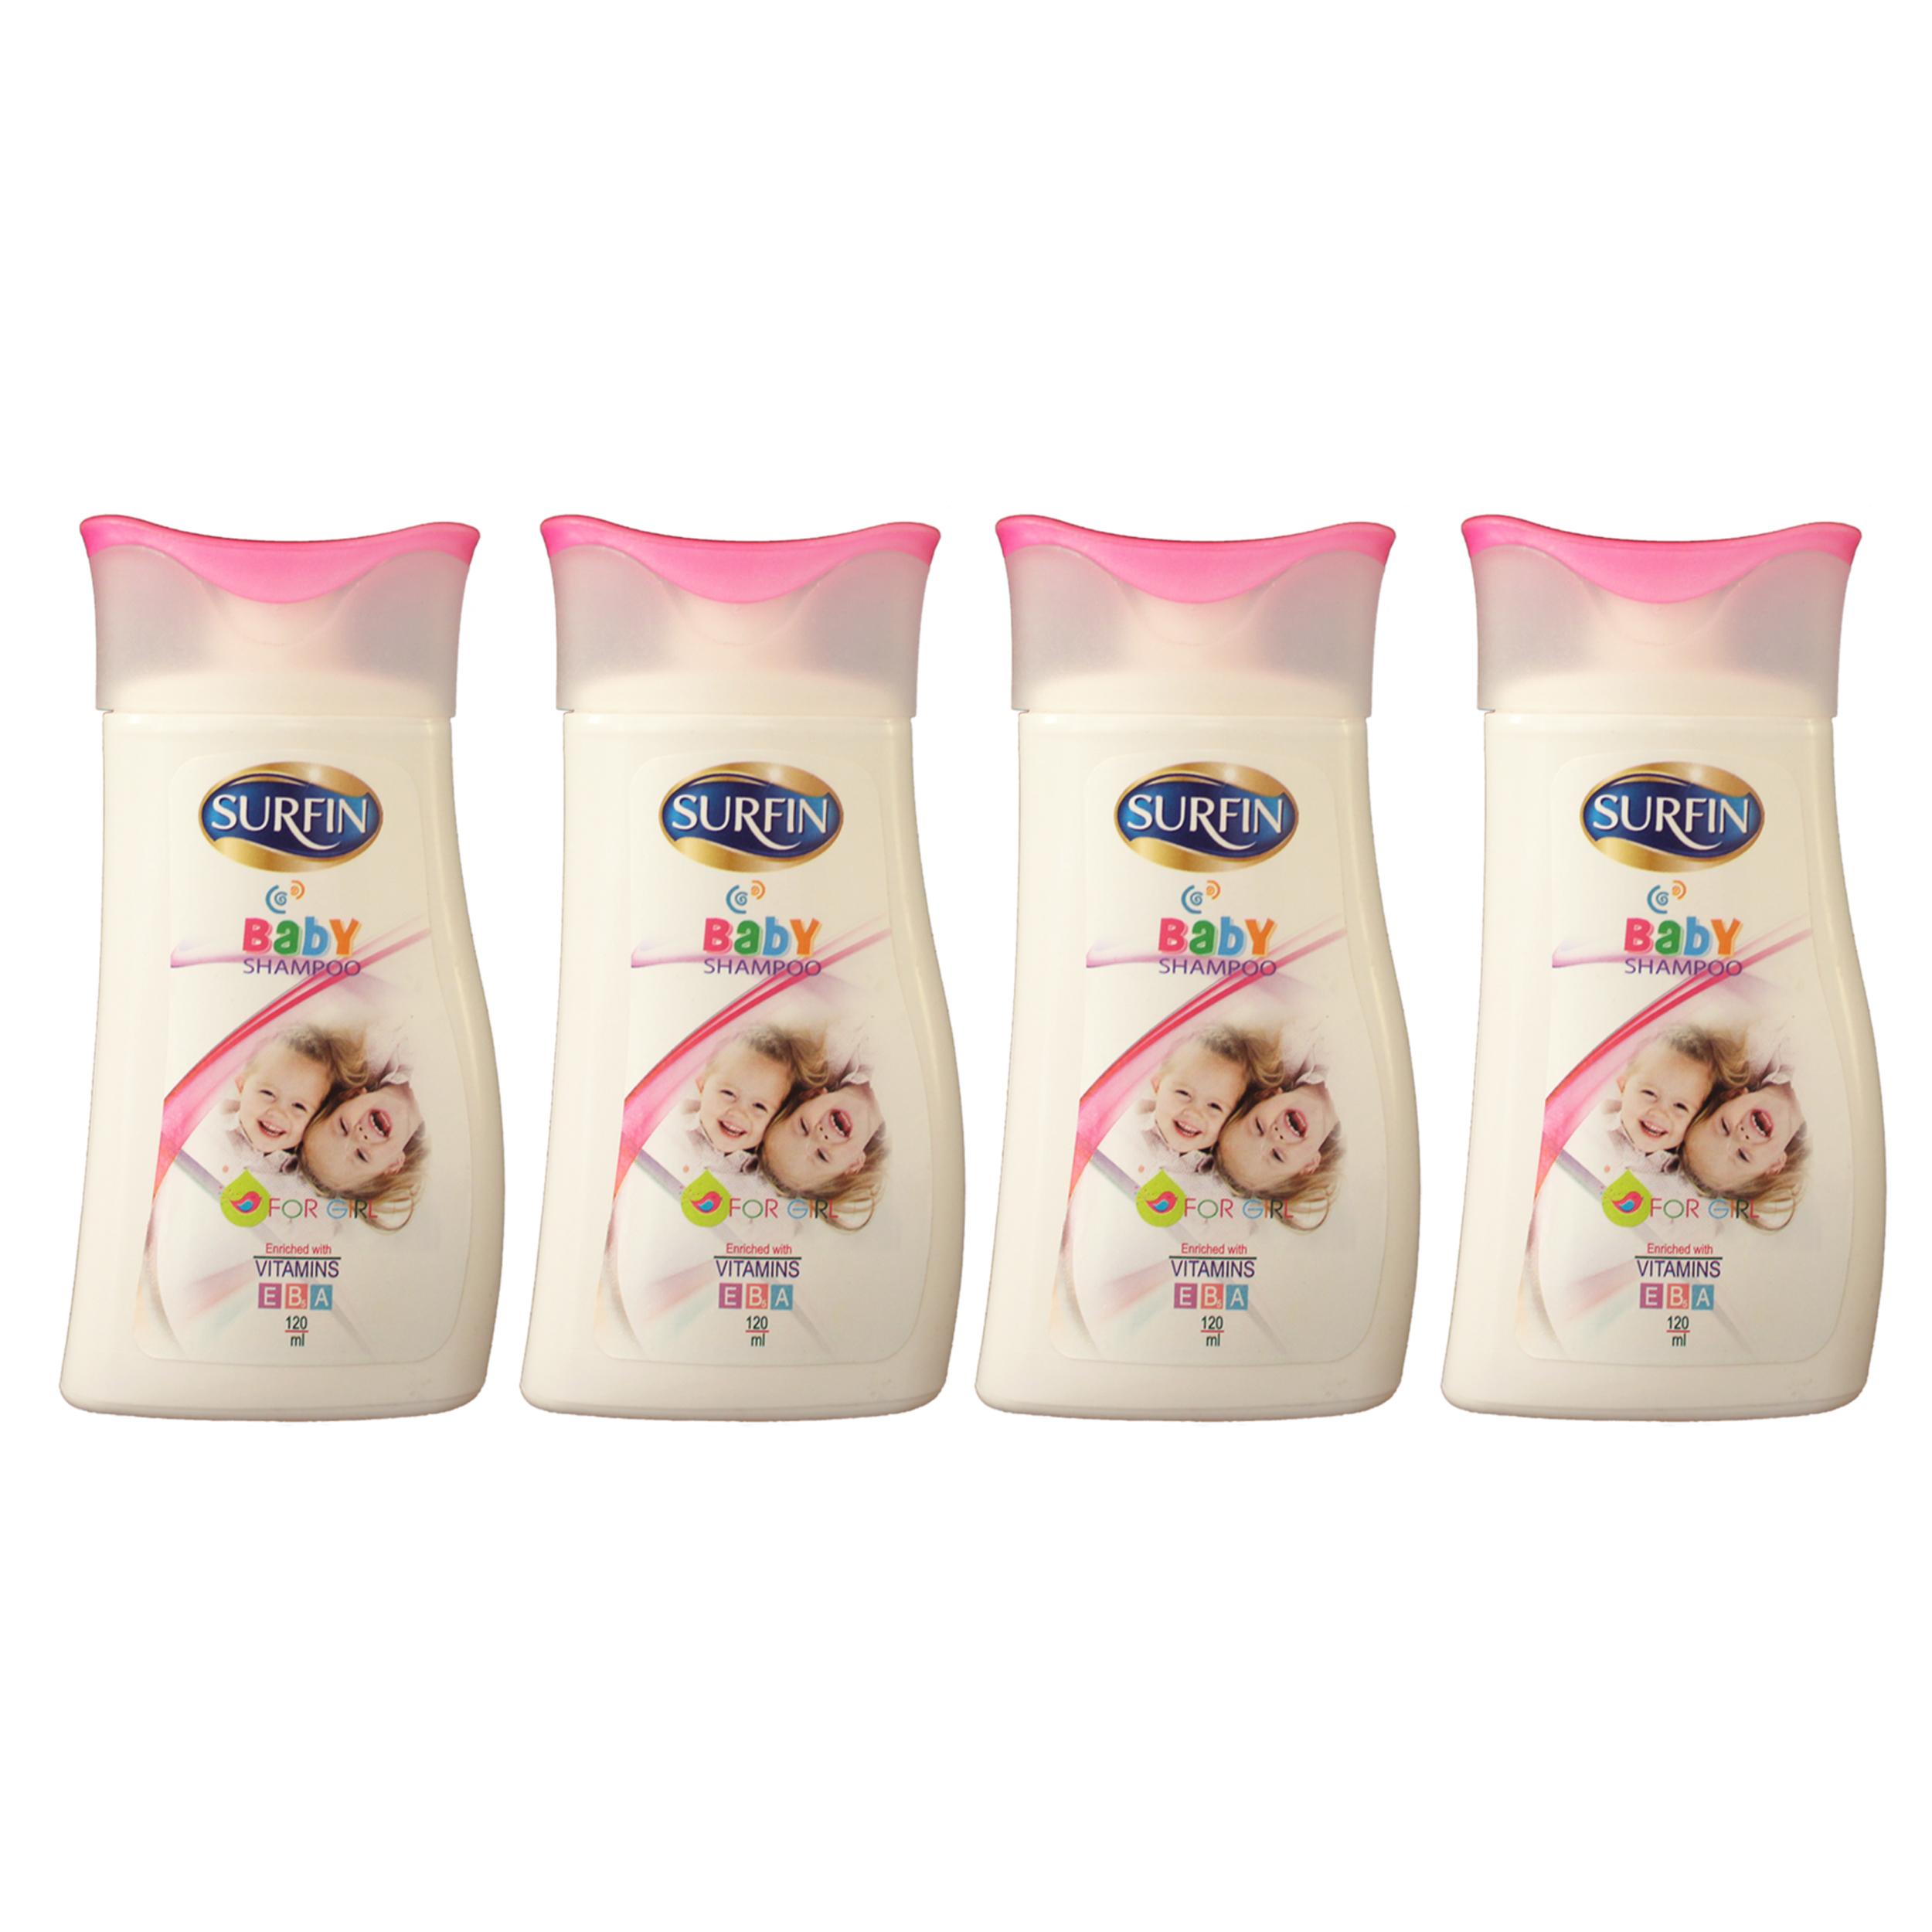 شامپو بچه سورفین مدل vitamin for girl حجم ۱۲۰ میلی لیتر مجموعه ۴ عددی